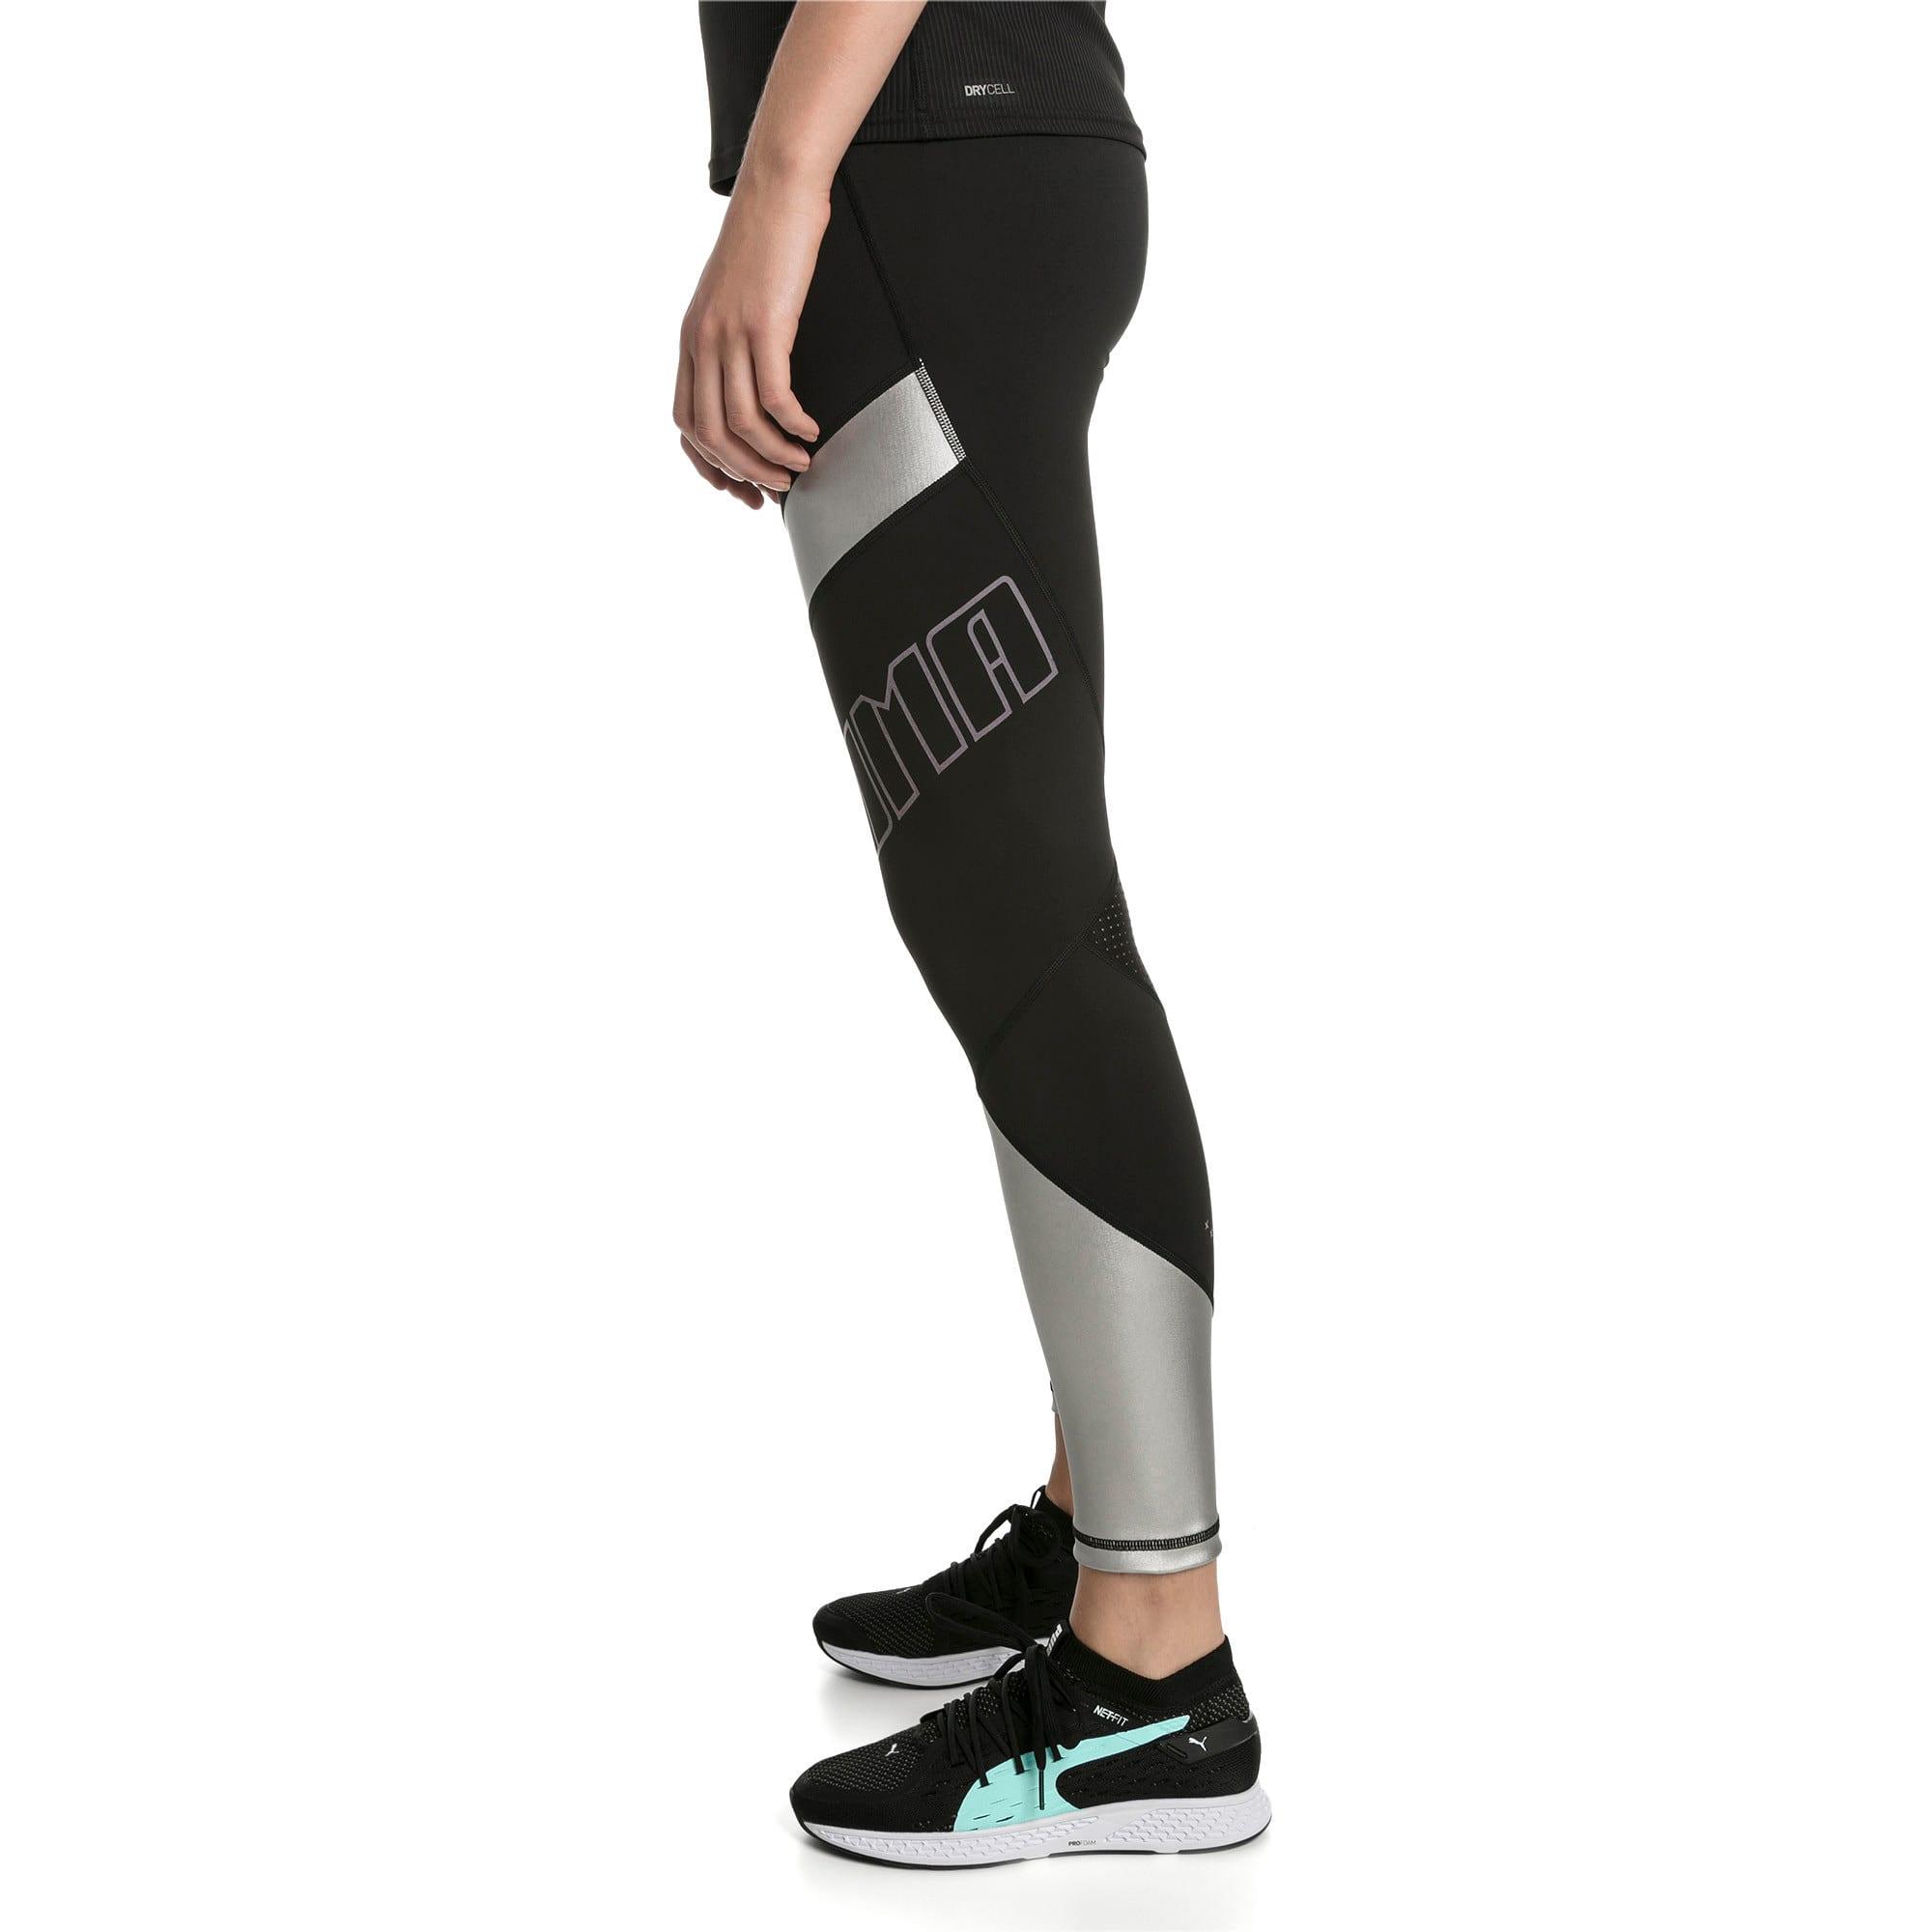 Thumbnail 1 of Elite Speed Women's Leggings, Puma Black-Silver, medium